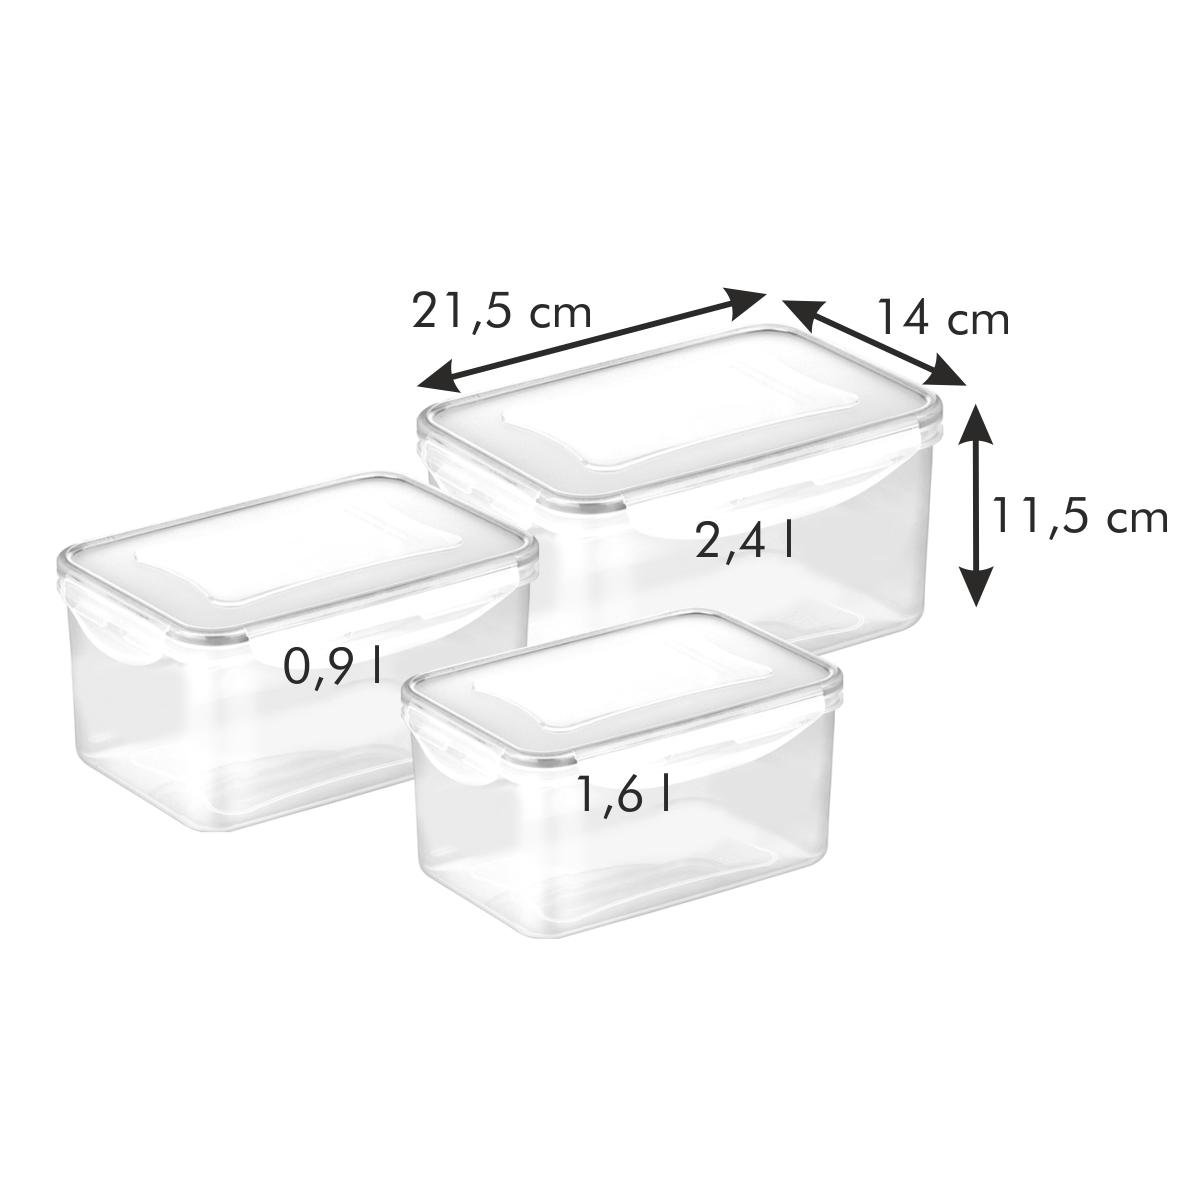 Dóza FRESHBOX 3 ks, 0,9, 1,6, 2,4 l, hluboká